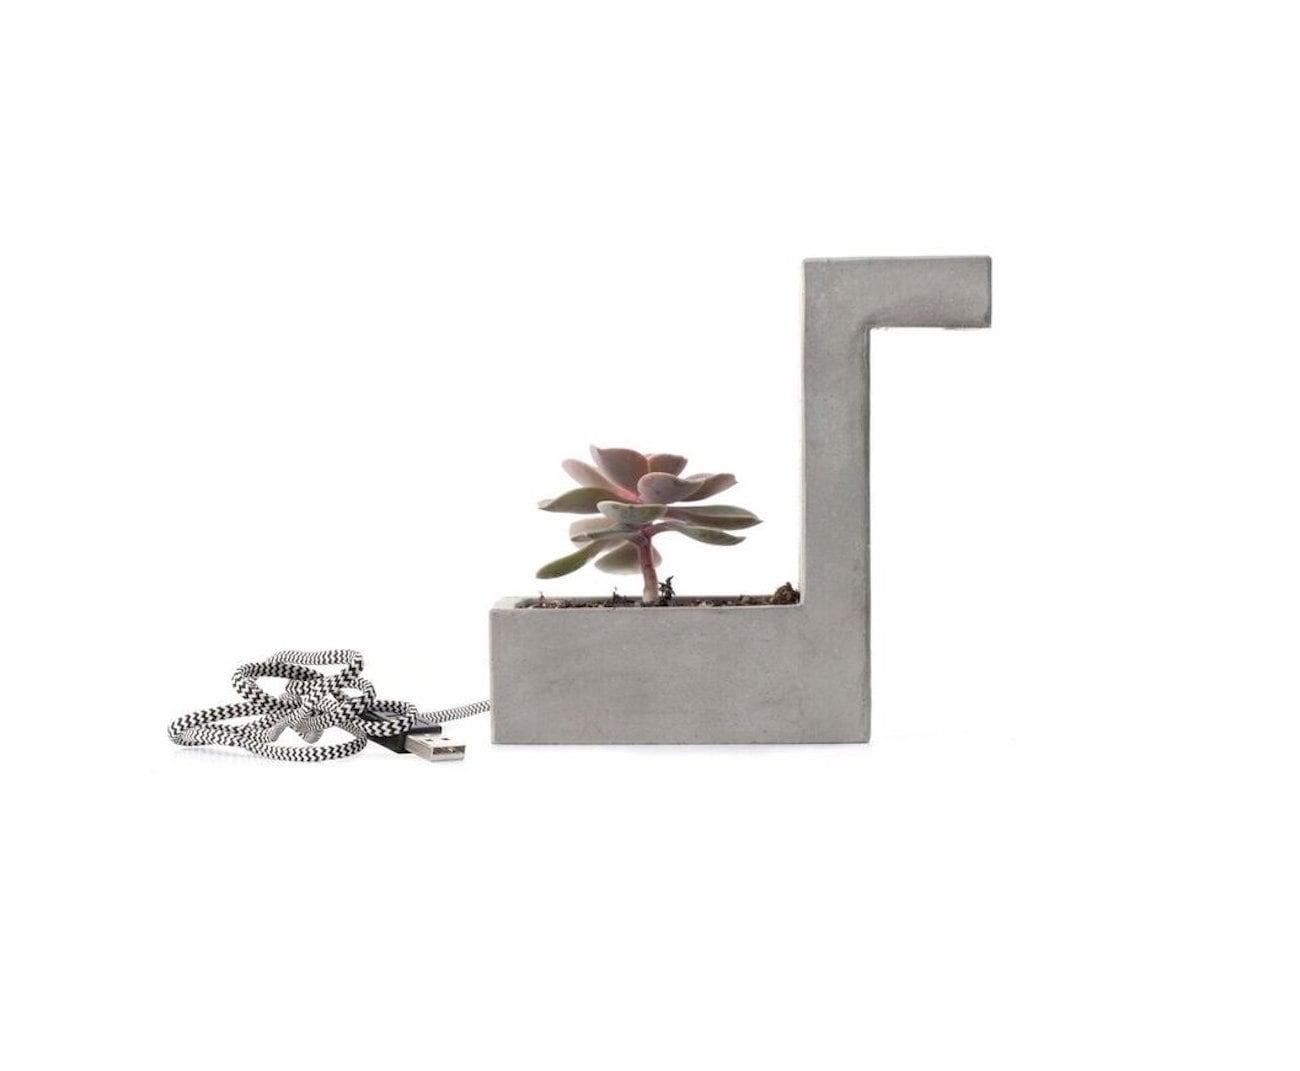 Kikkerland Concrete Desk Lamp Planter